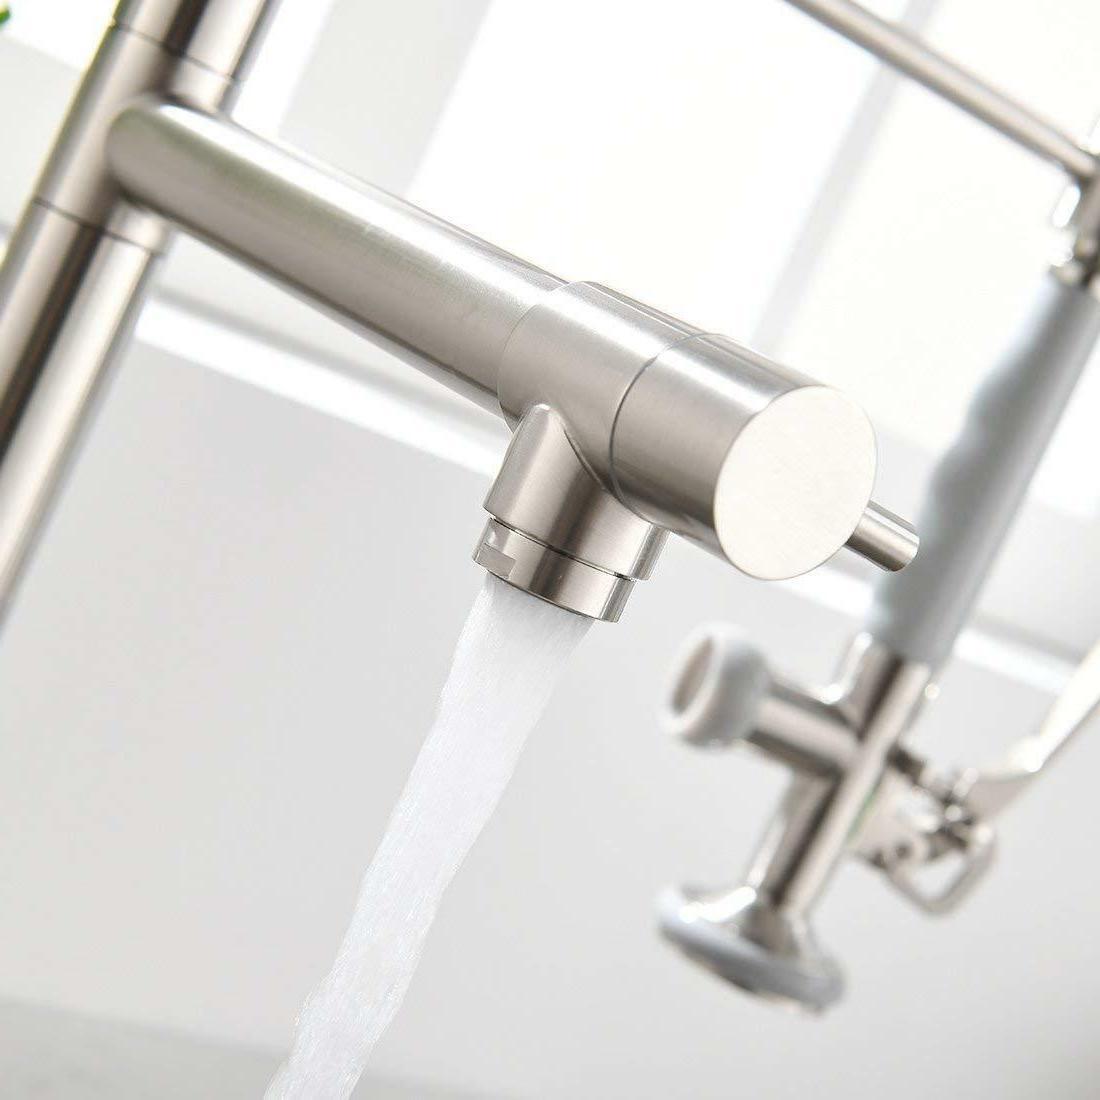 Single Pull Kitchen Sink Faucet Sprayer Nickel